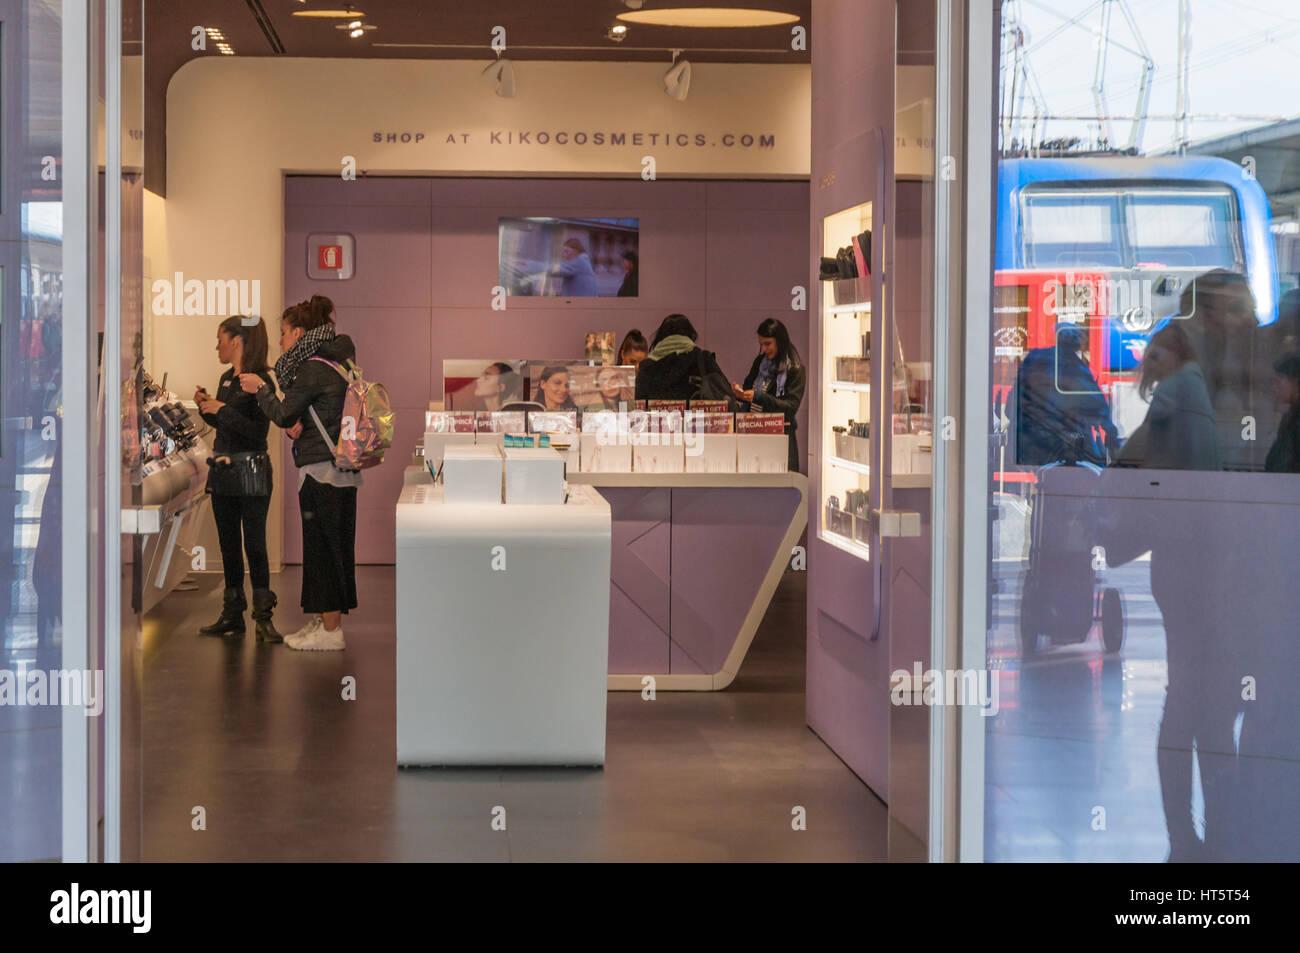 Kiko Milano Store Stockfotos & Kiko Milano Store Bilder - Alamy